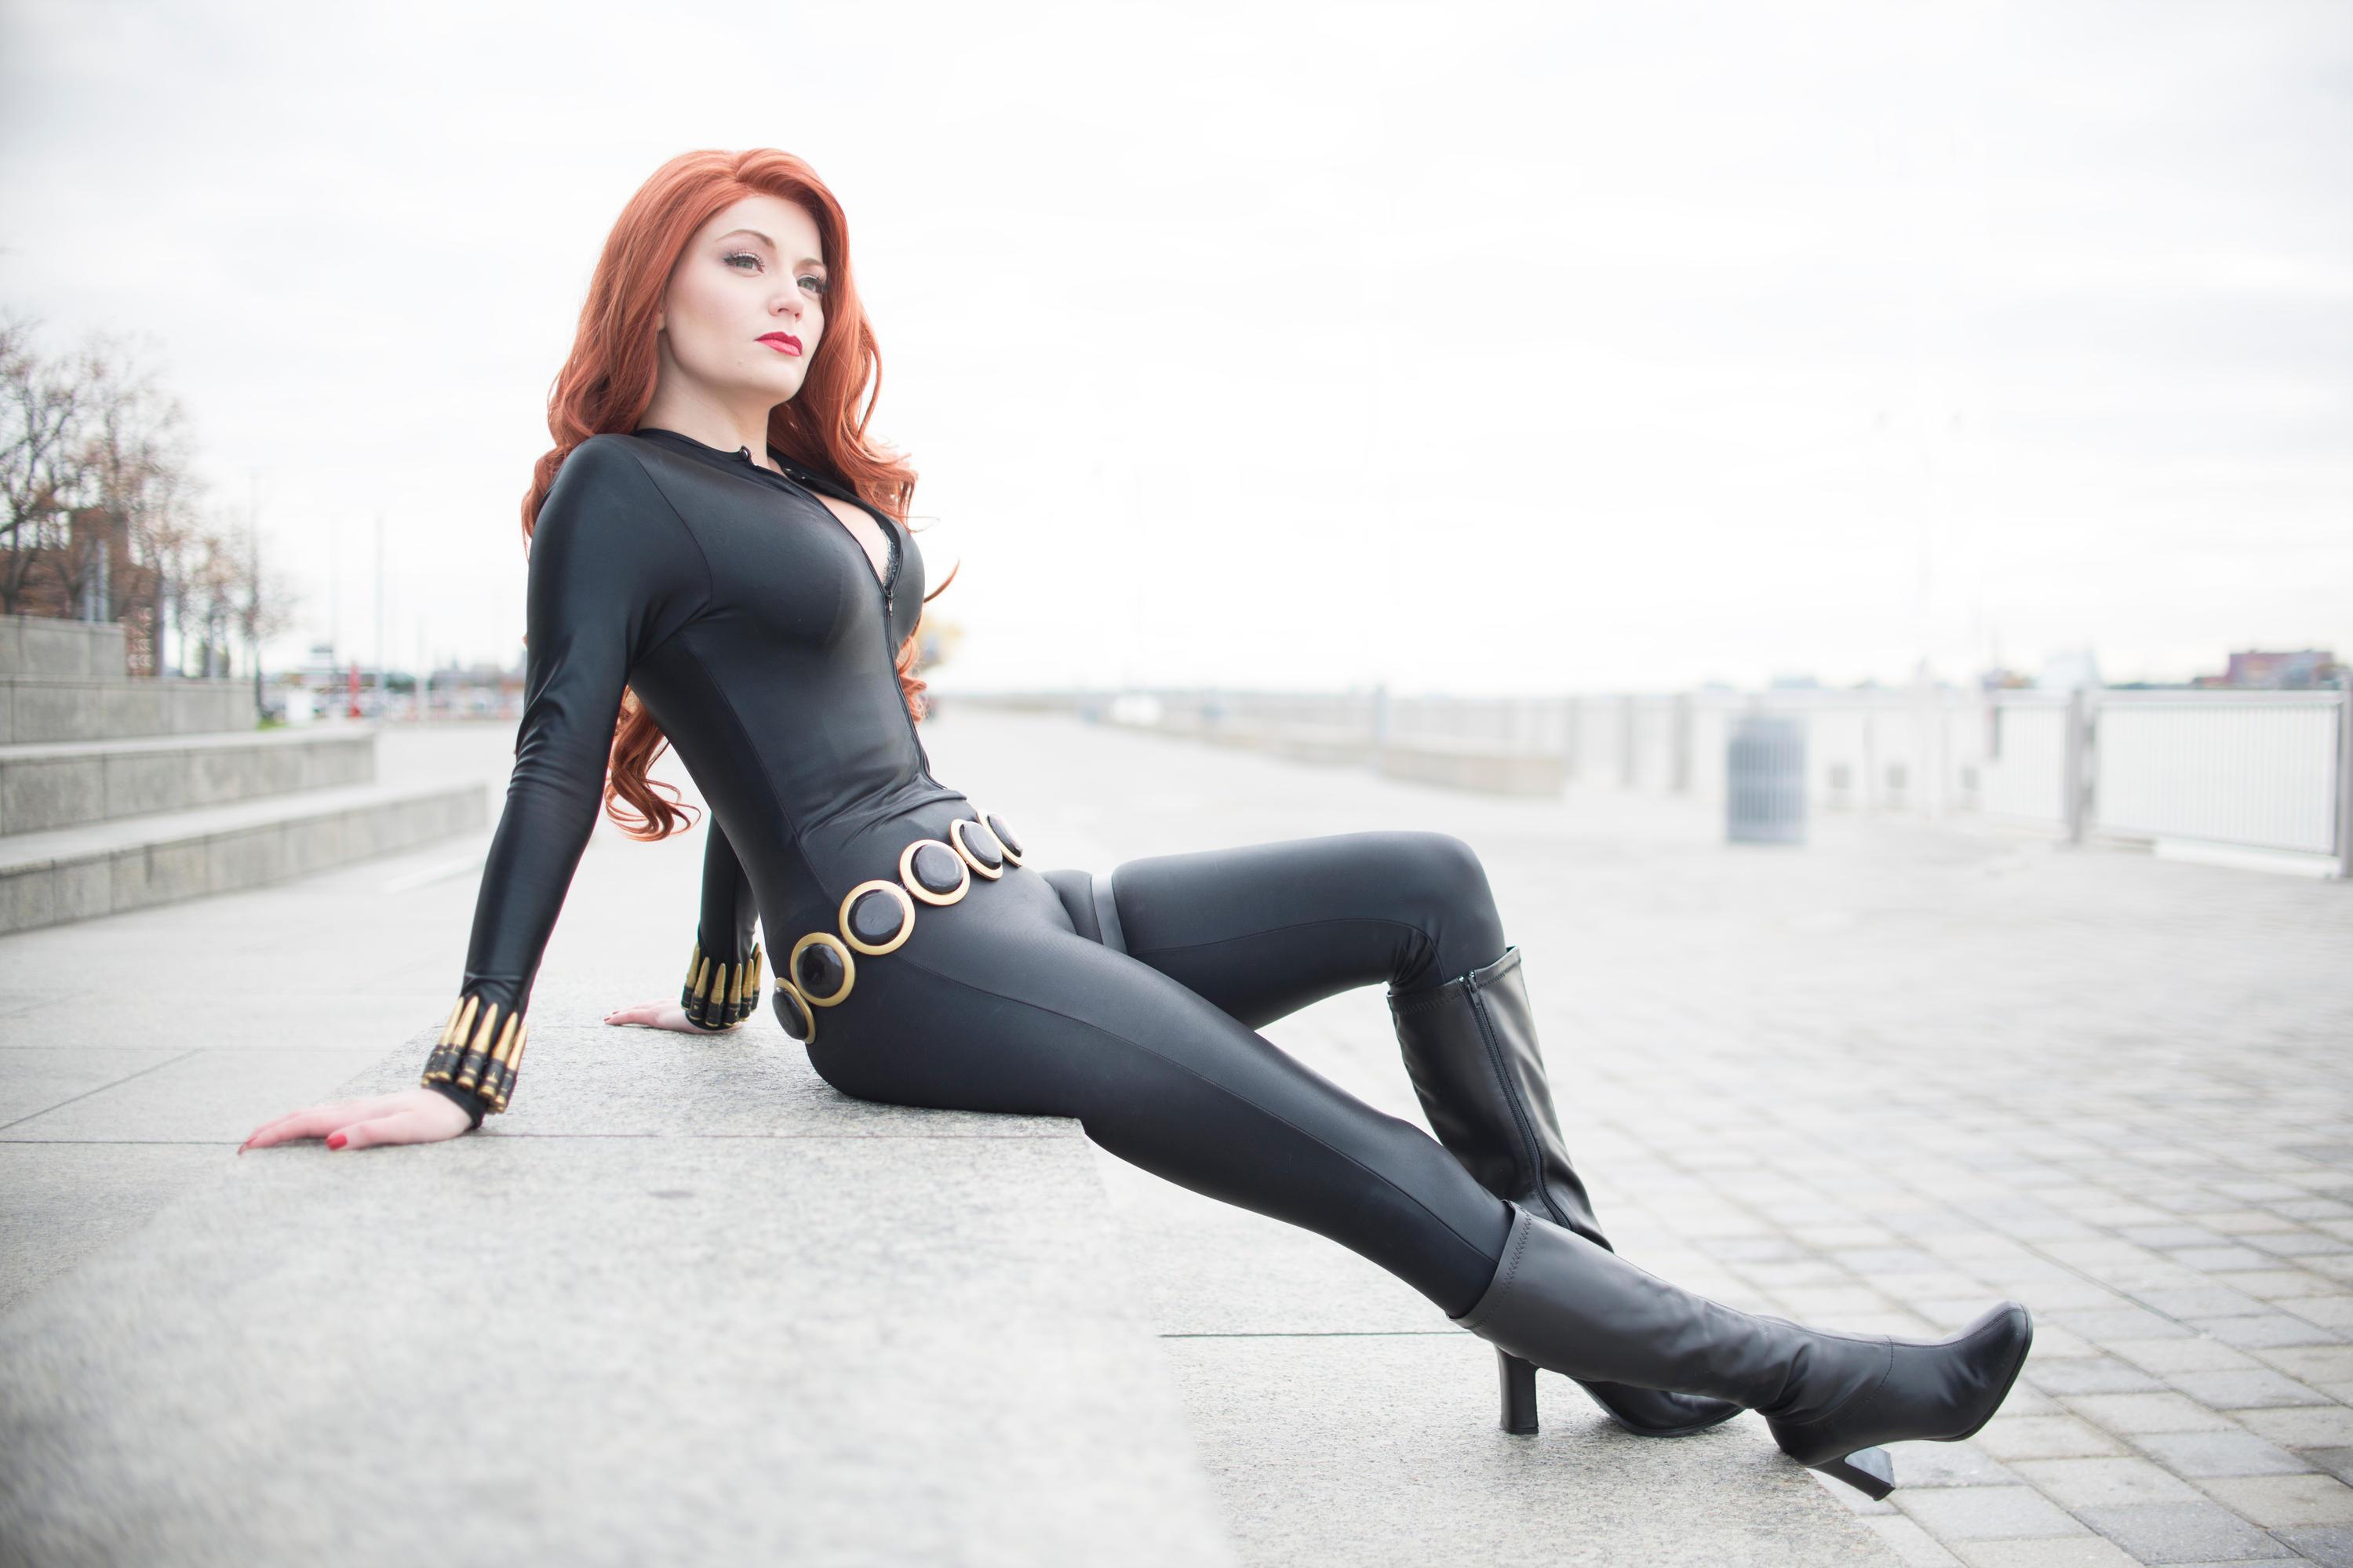 2048x1152 Cosplay Black Widow 2048x1152 Resolution HD 4k